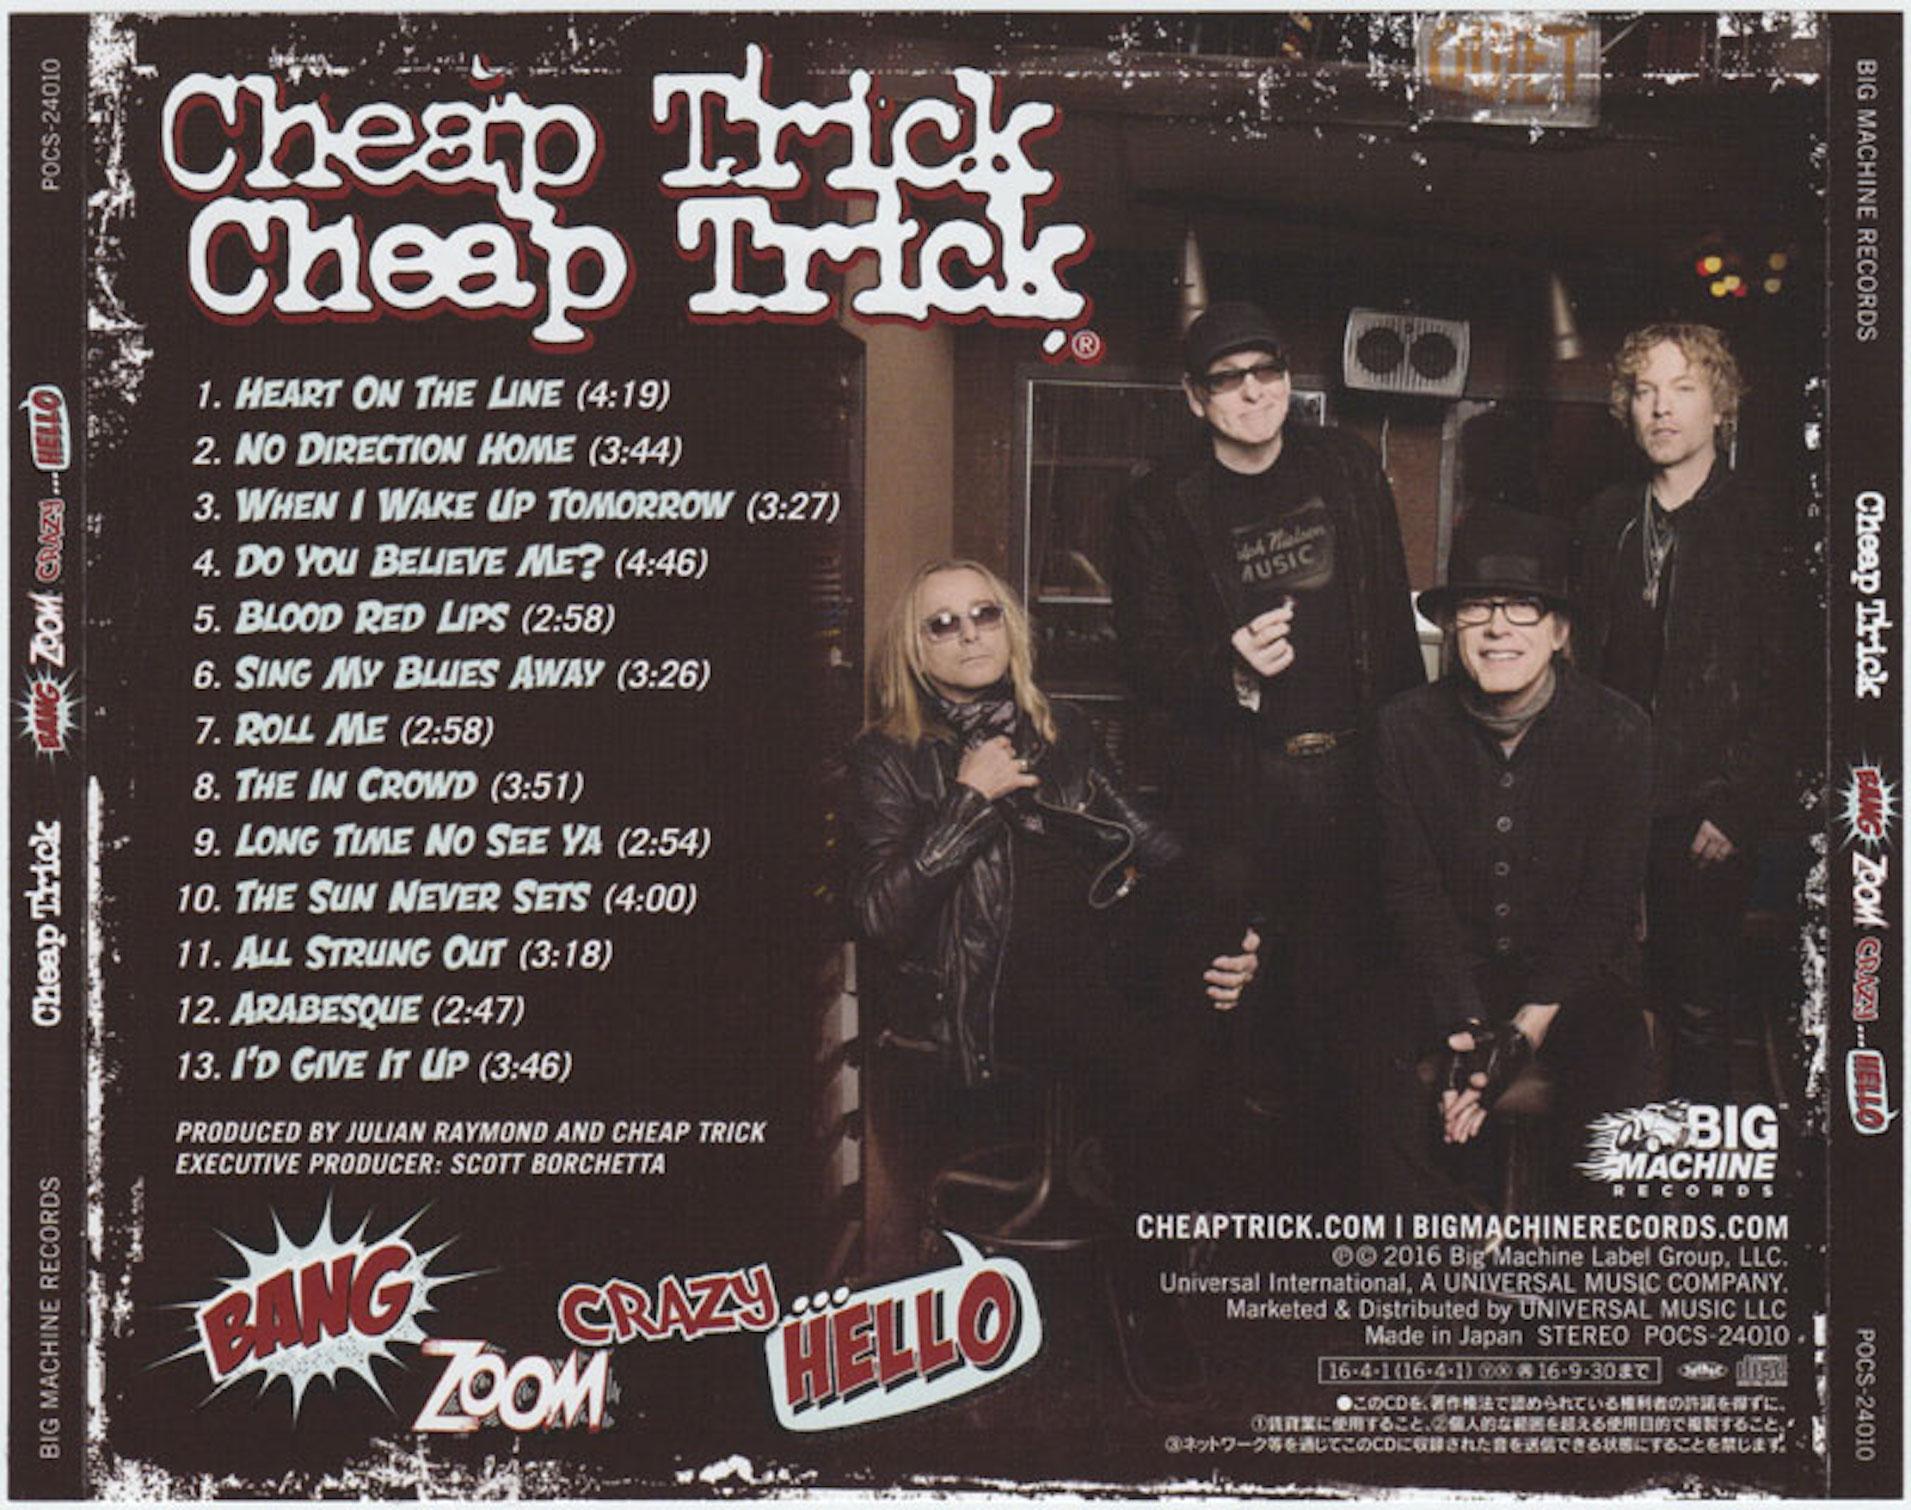 781ed0d71e8a04 Cheap Trick - Bang Zoom Crazy... Hello (Japanese Edition) (2016) - back